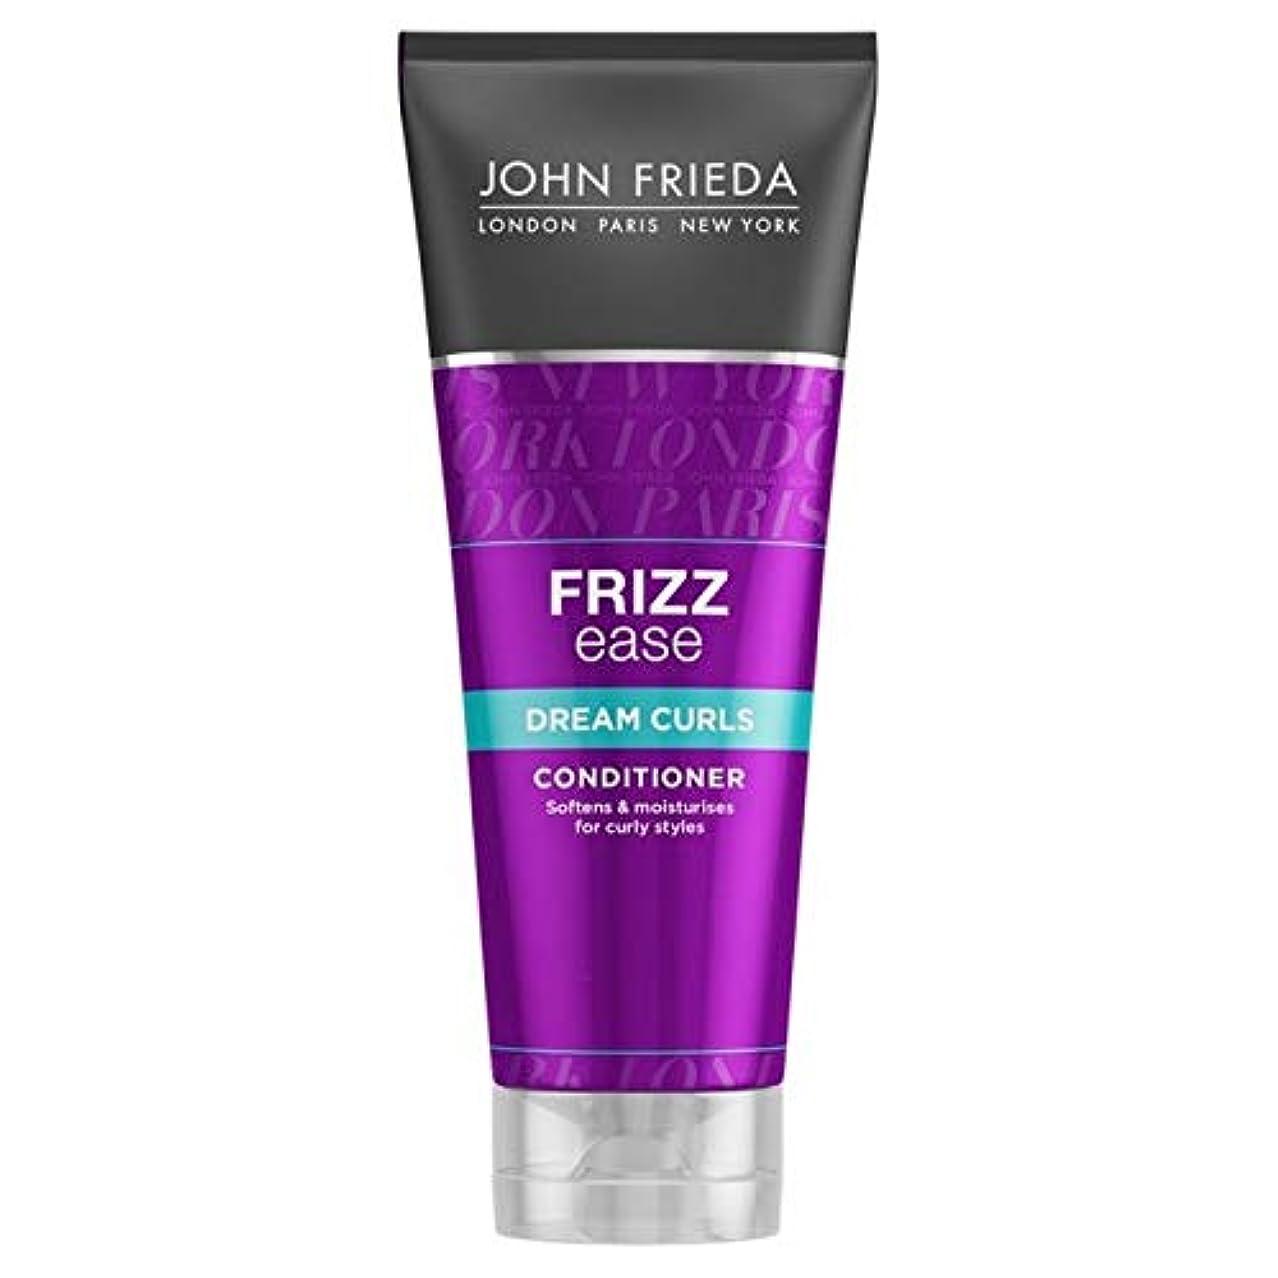 [John Frieda ] ジョン?フリーダ縮れ容易夢のカールコンディショナー250Ml - John Frieda Frizz Ease Dream Curls Conditioner 250ml [並行輸入品]